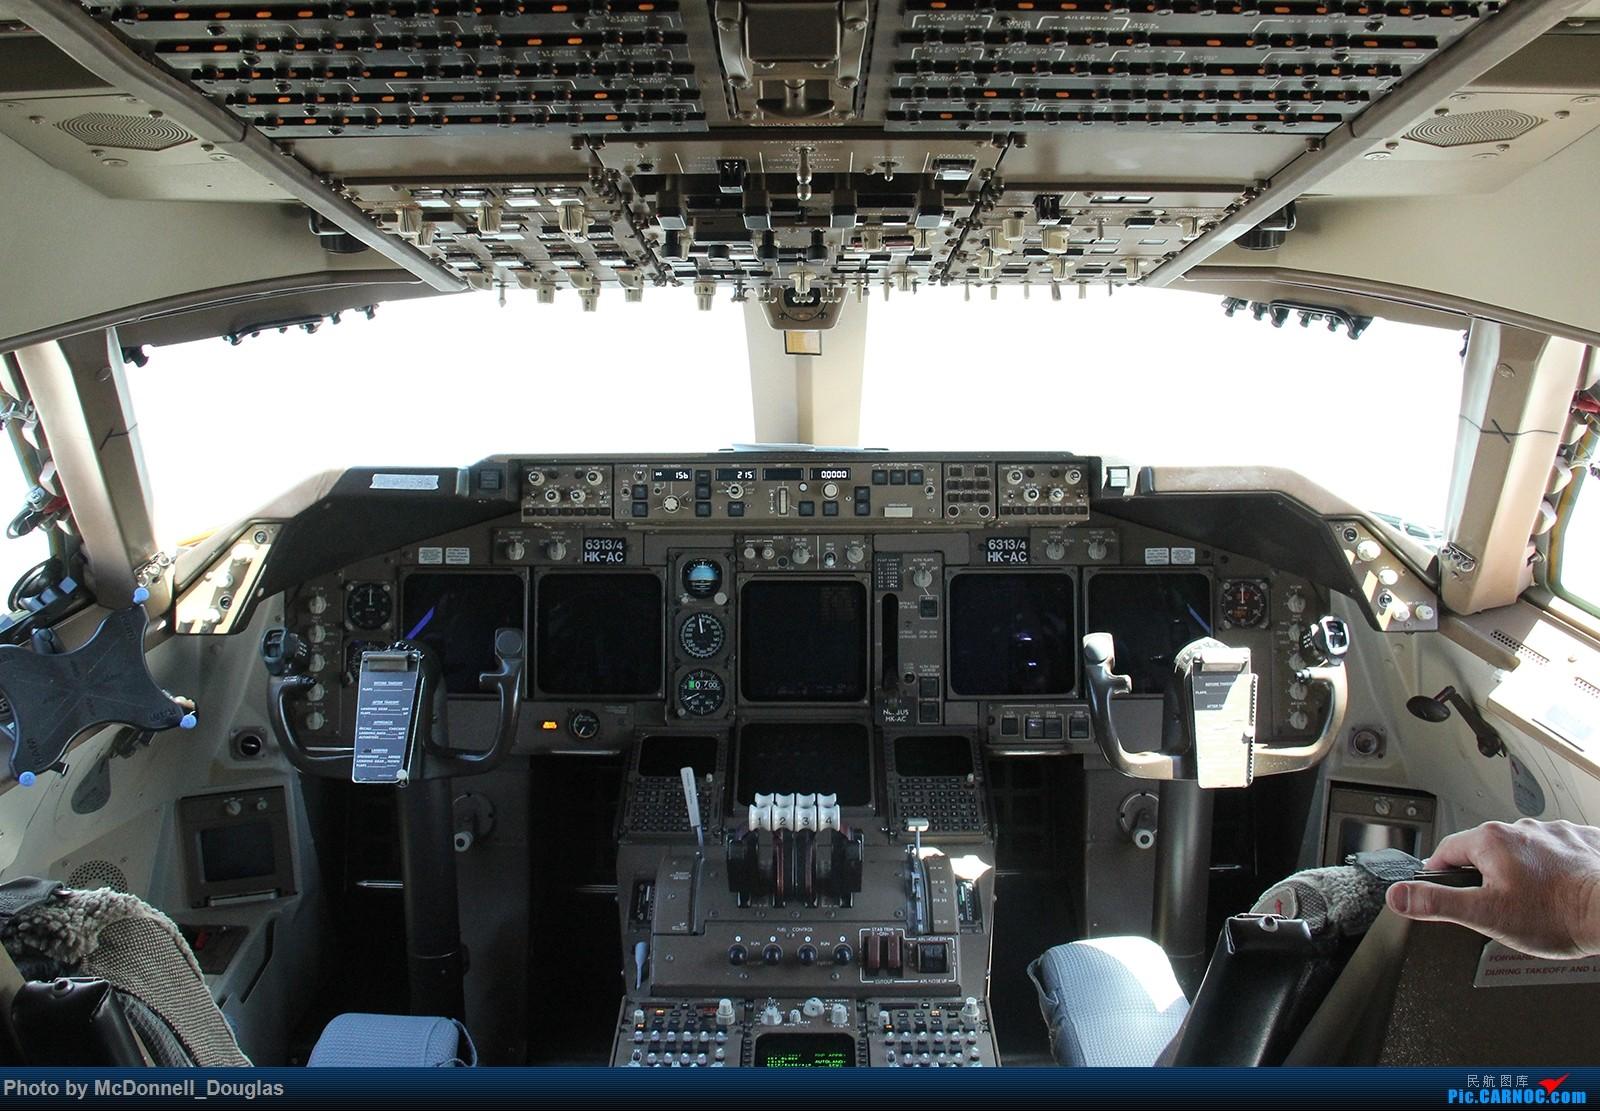 Re:[原创]【上海飞友会】图会很多,也有很多驾驶舱,杂七杂八的美帝,梦寐以求的圣马丁,这更绝不弃贴,前十个id砸飞机砸一个返一个【驾驶舱已出现】 BOEING747-451 N673US 美国底特律都会韦恩郡机场